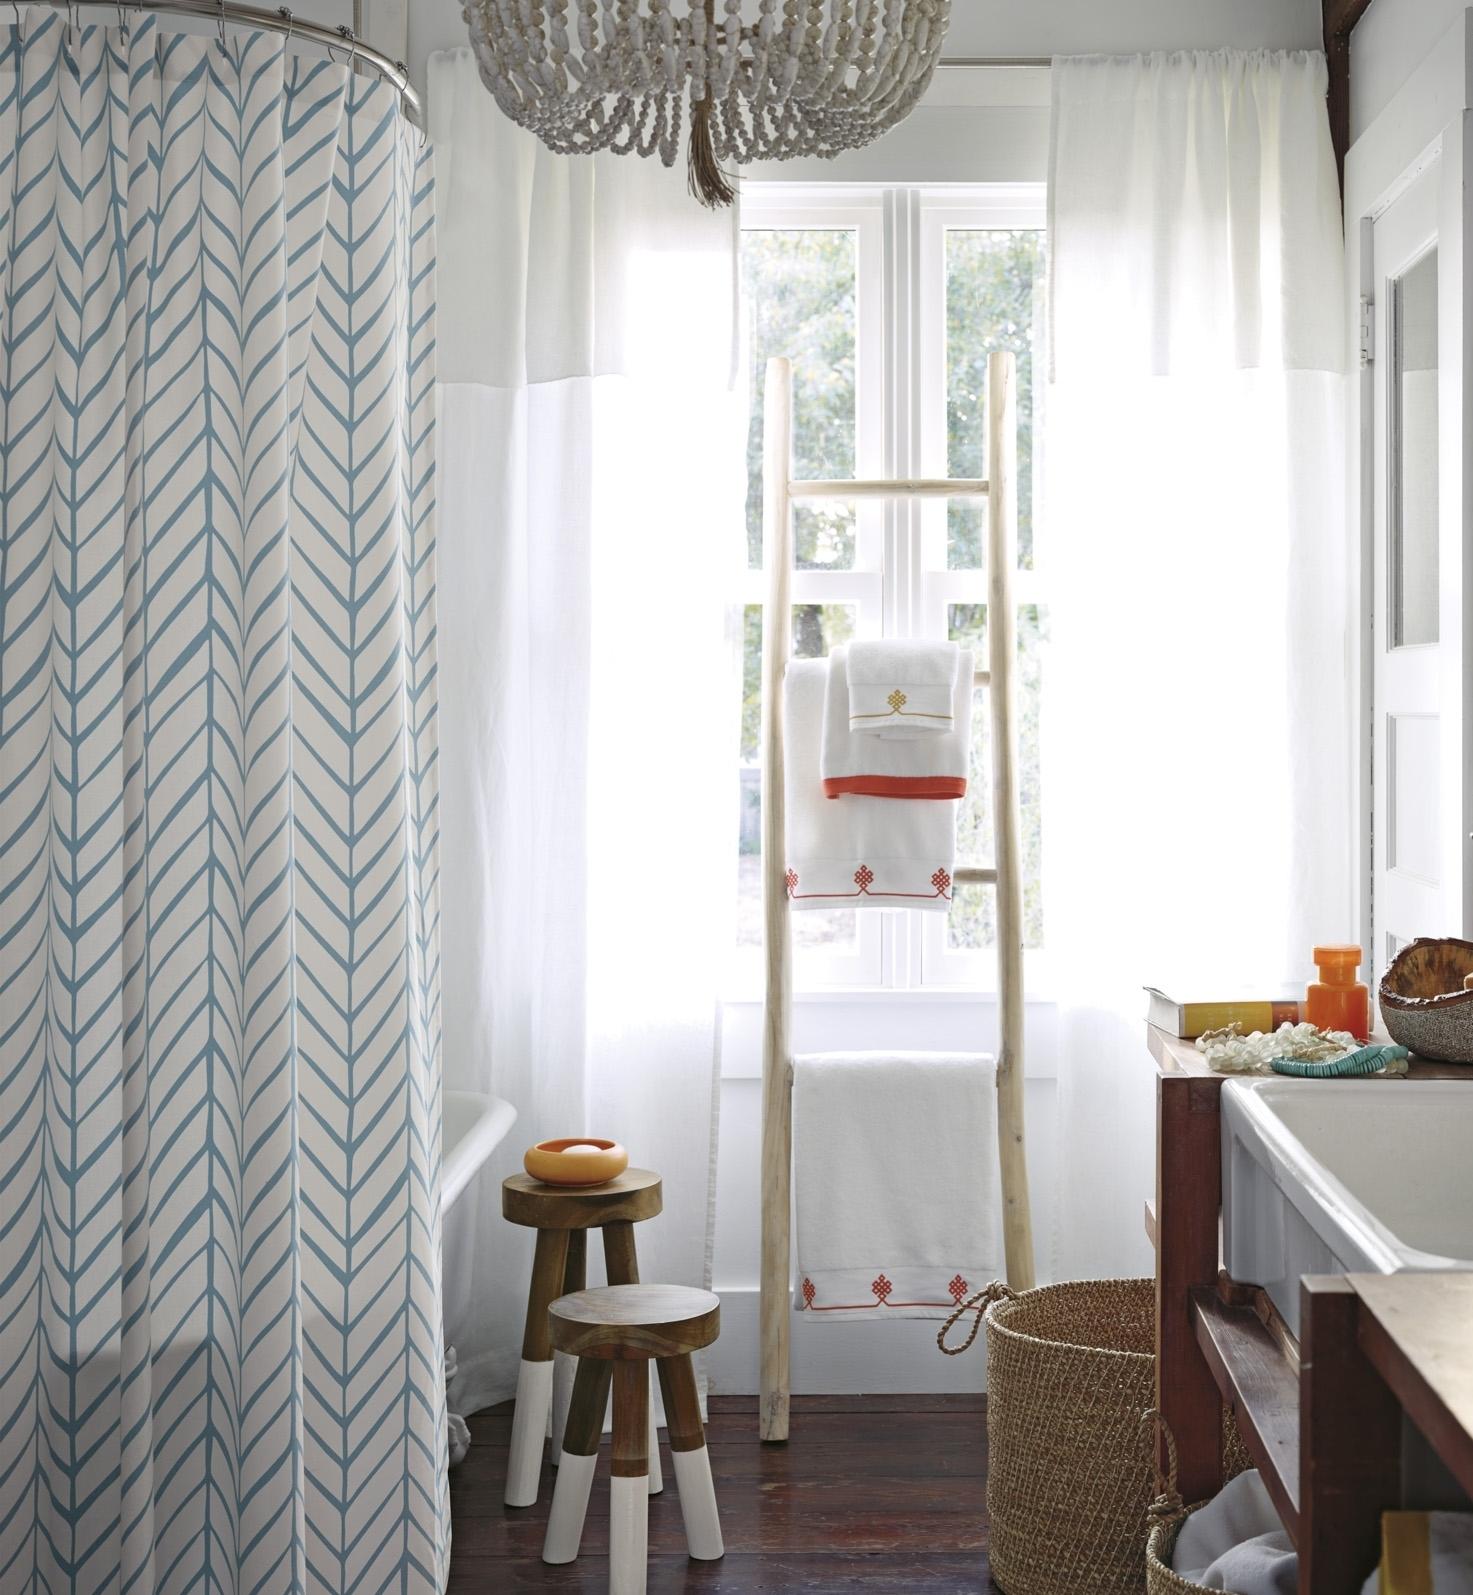 Rideau douche original design maison design for Rideau de douche original